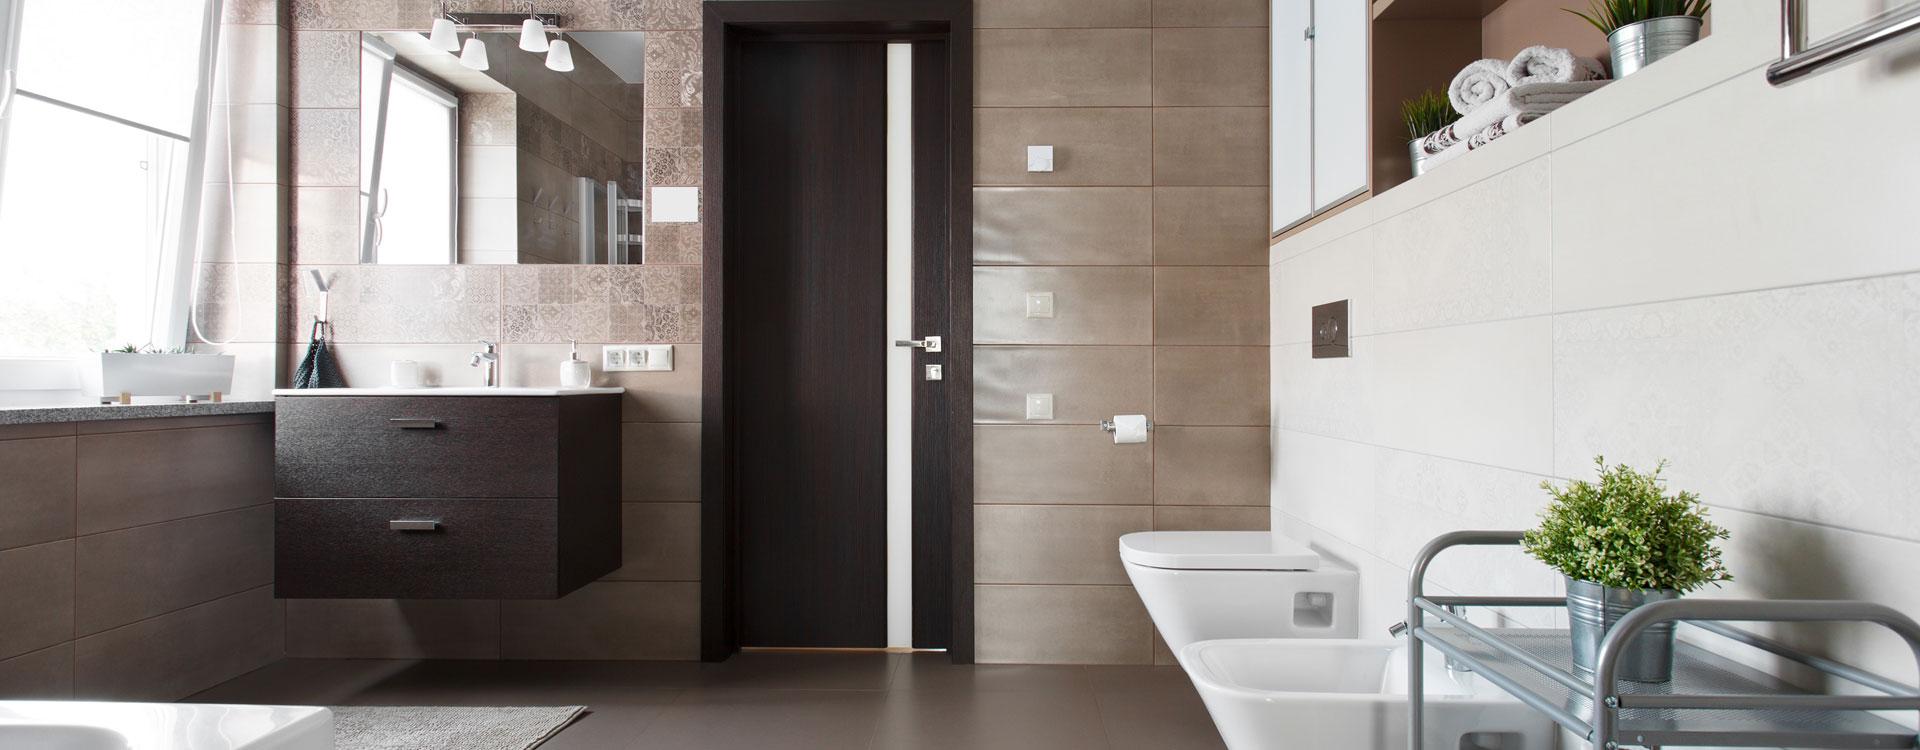 Relianzi Brisbane Bathroom Renovators Slider 3